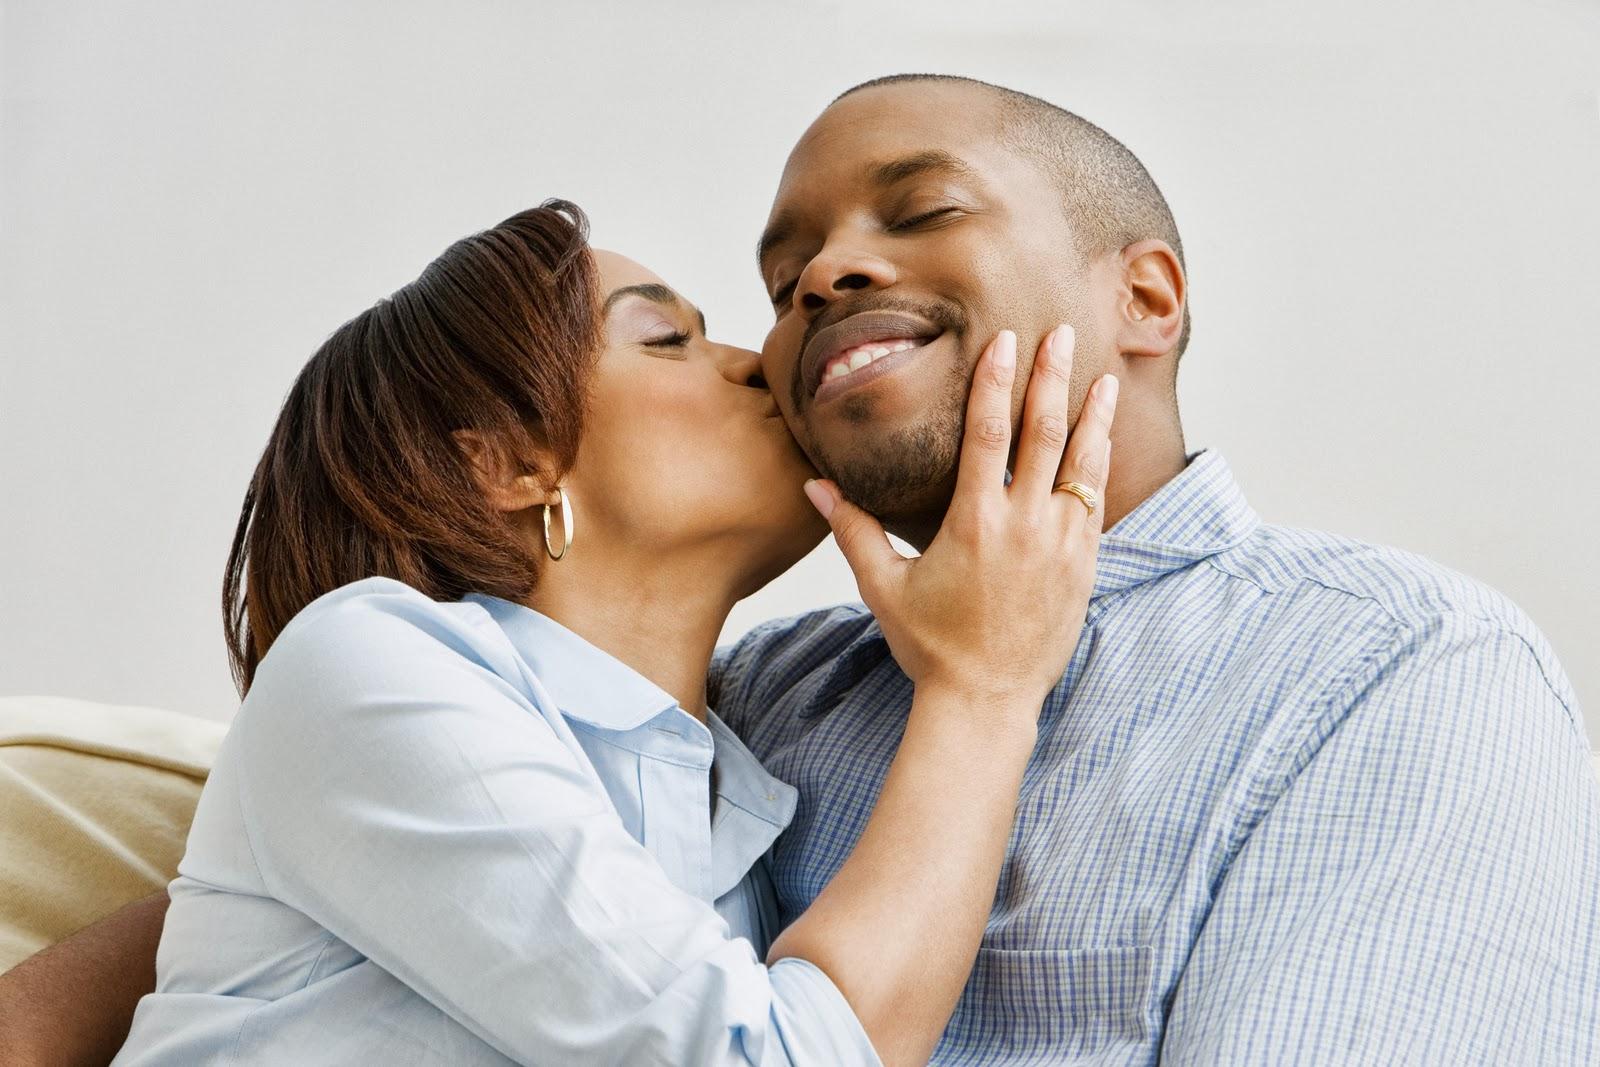 seniorblackpeoplemeetcom  The Senior Black Dating Network